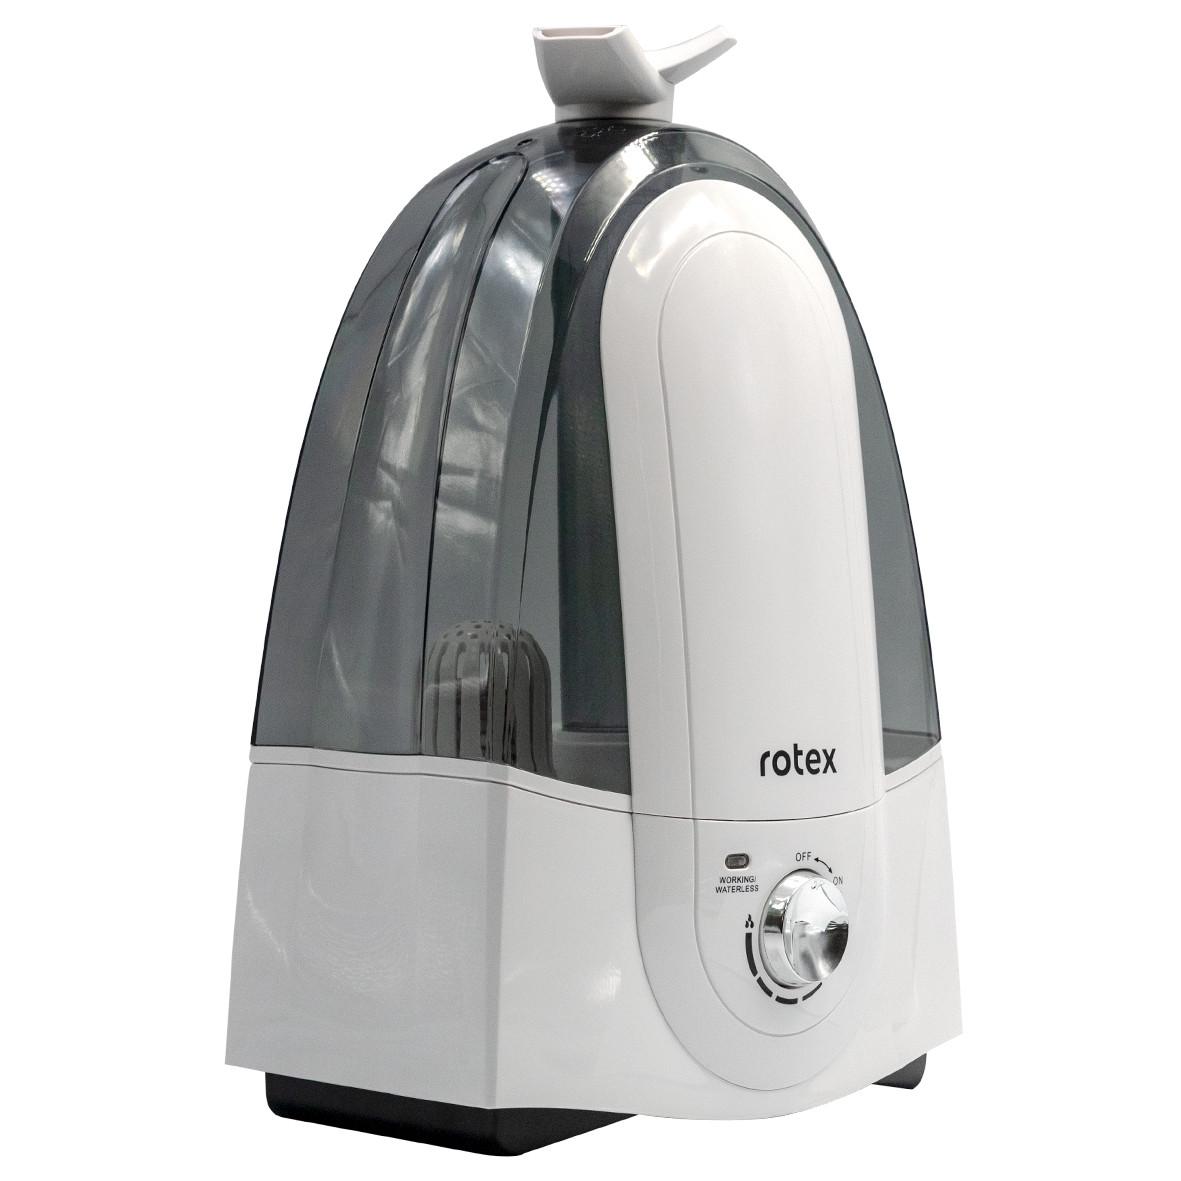 Увлажнитель воздуха Rotex RHF520-W (Ротекс)